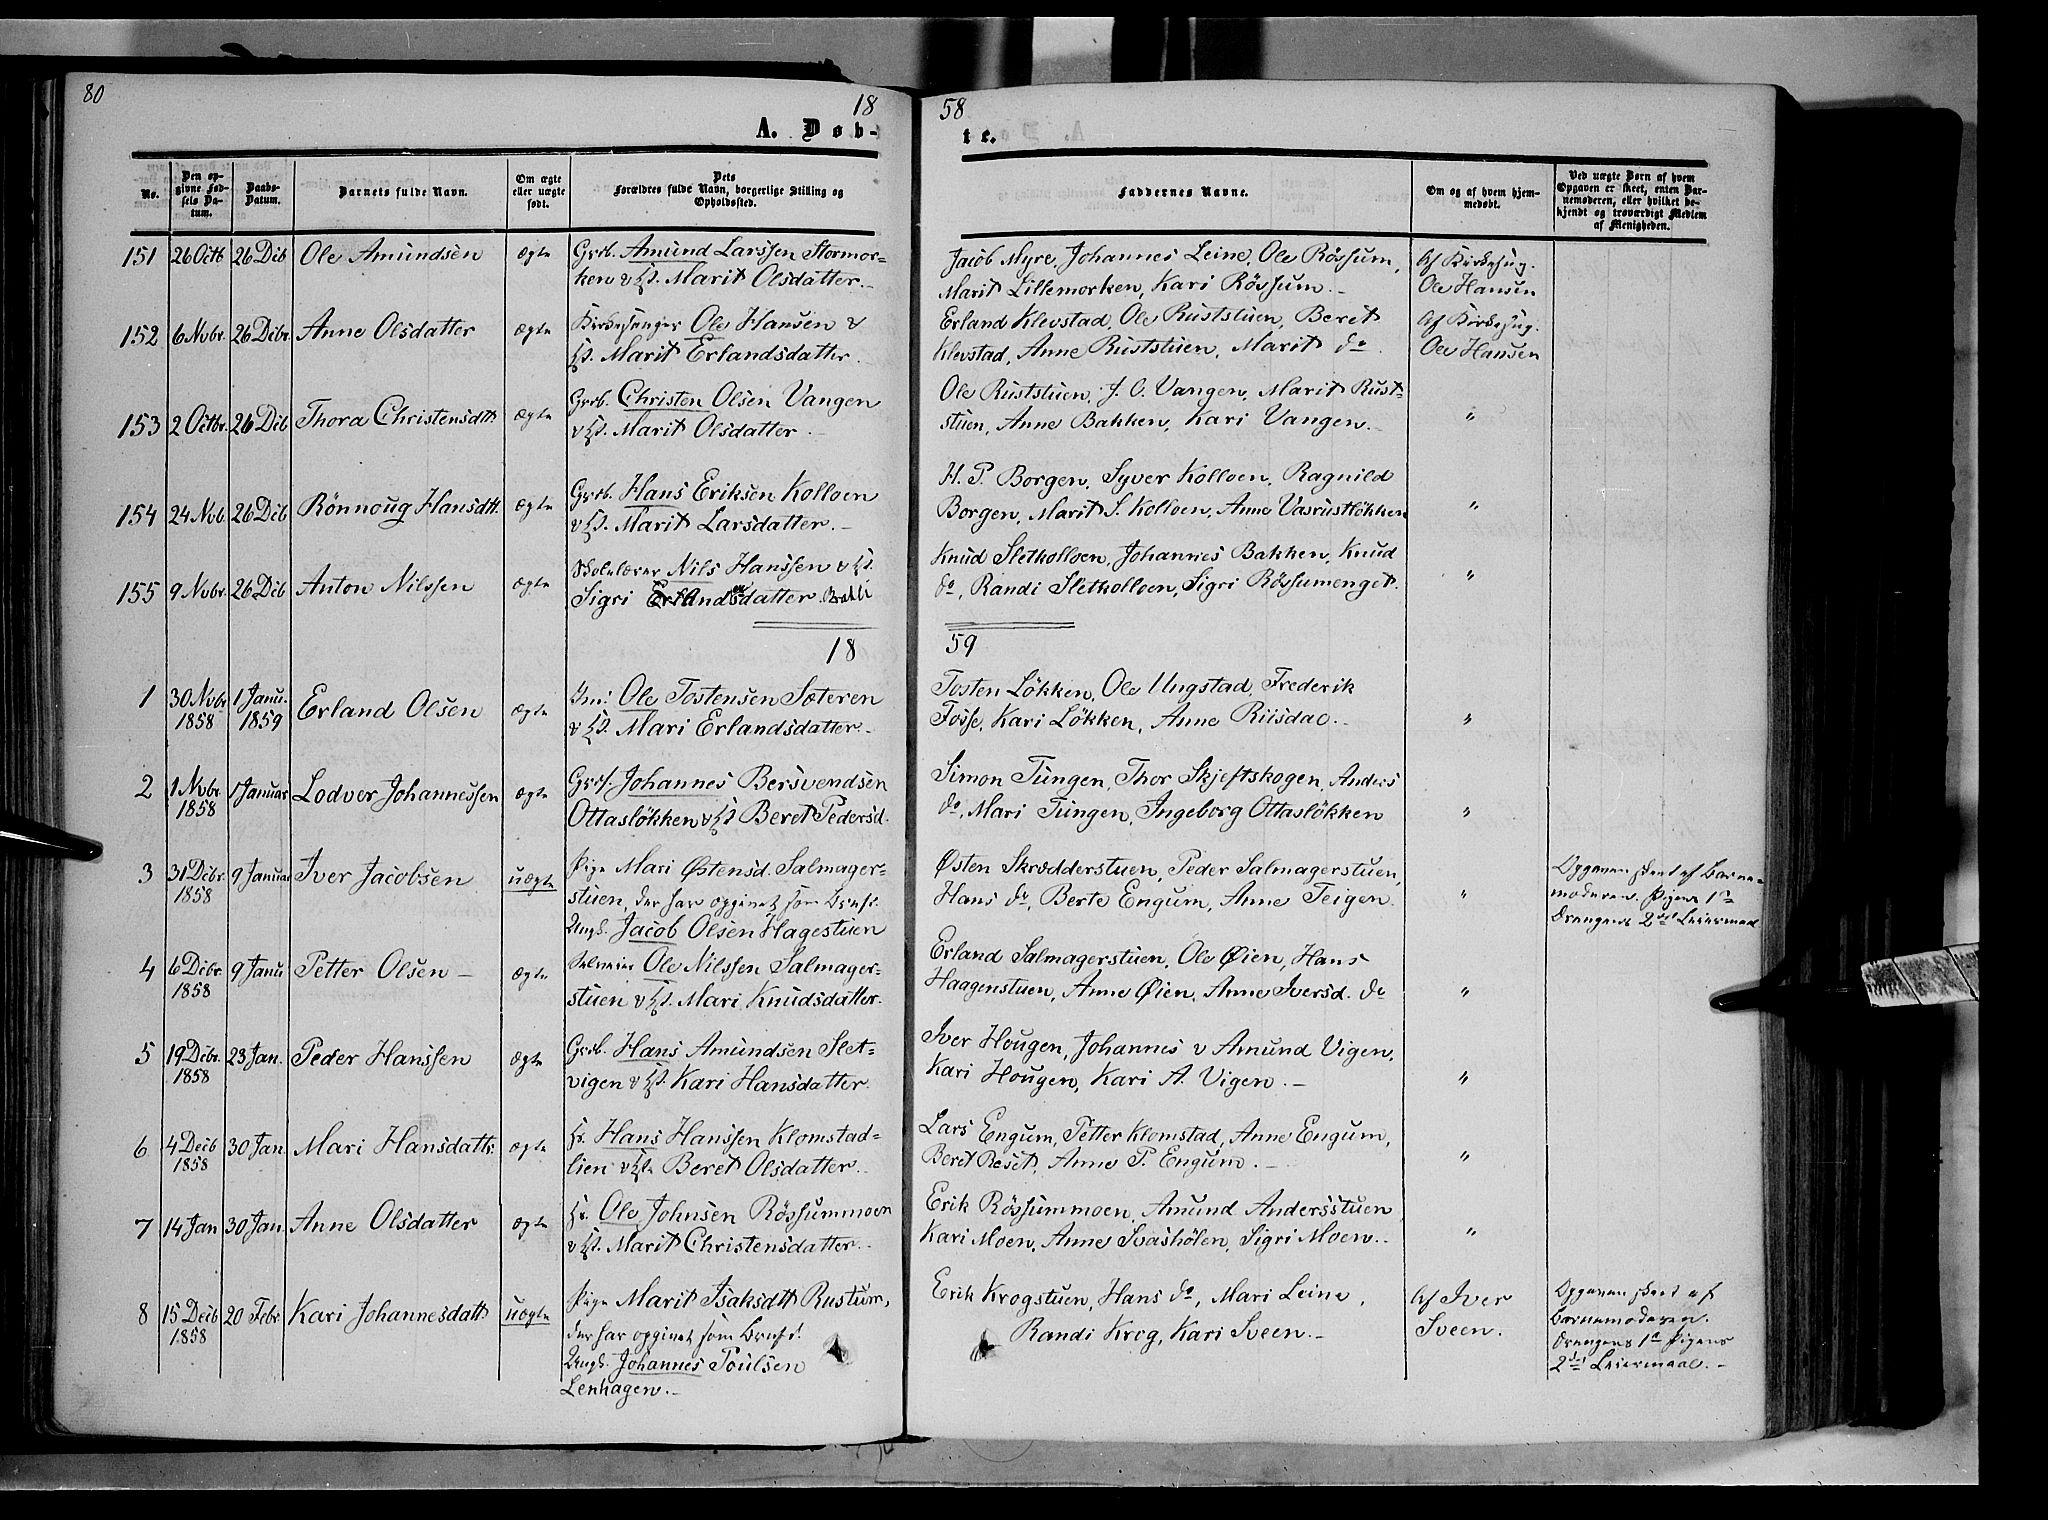 SAH, Nord-Fron prestekontor, Ministerialbok nr. 1, 1851-1864, s. 80